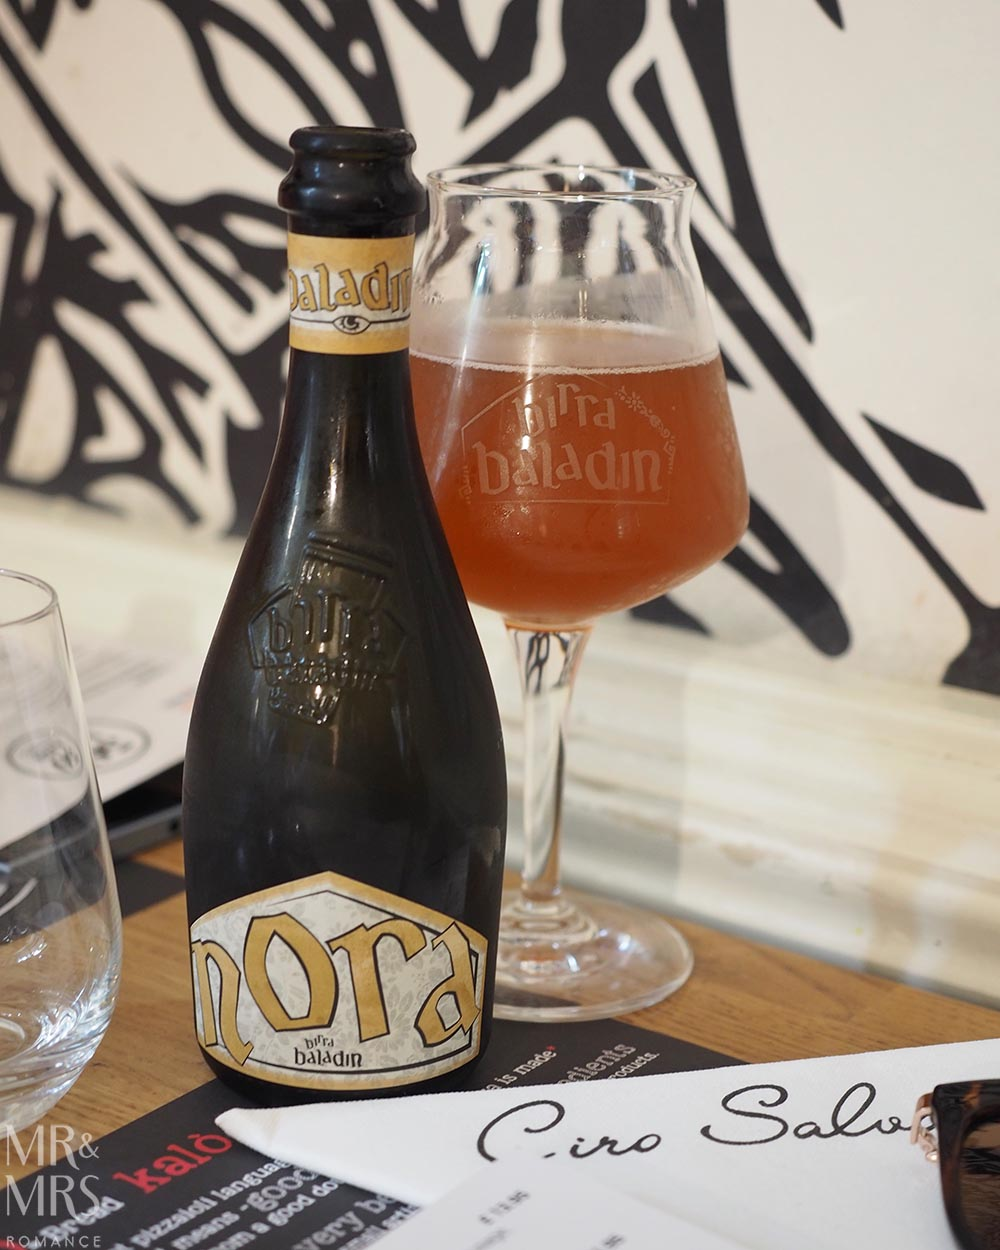 Italian Craft Beer at 50 Kalo di Ciro Salvo Pizza London